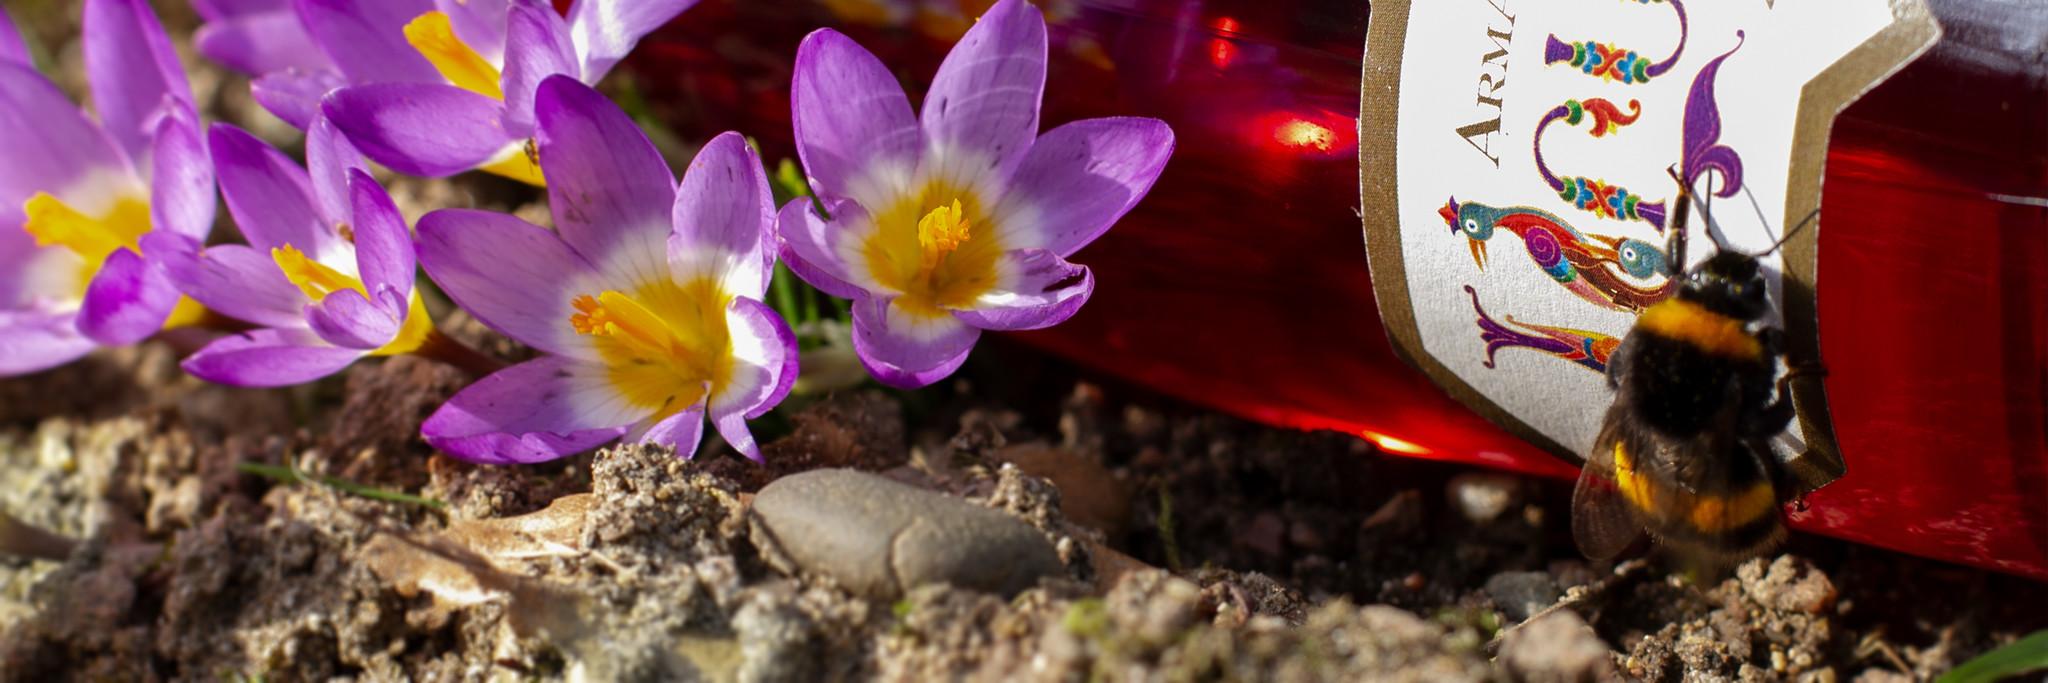 Dijso Spring